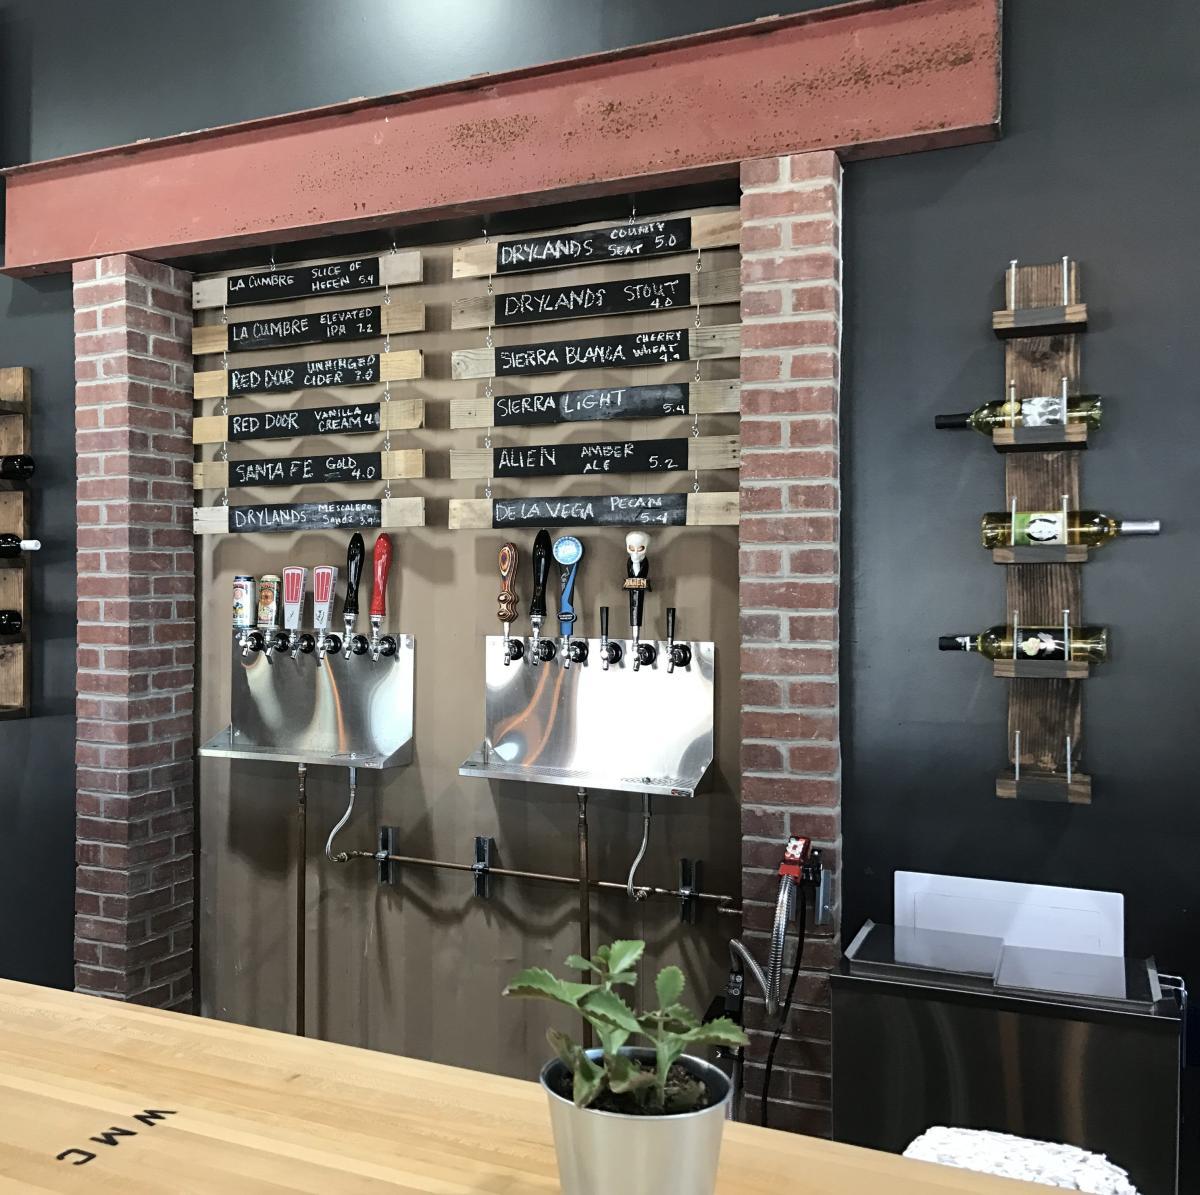 Drylands Brewing Company